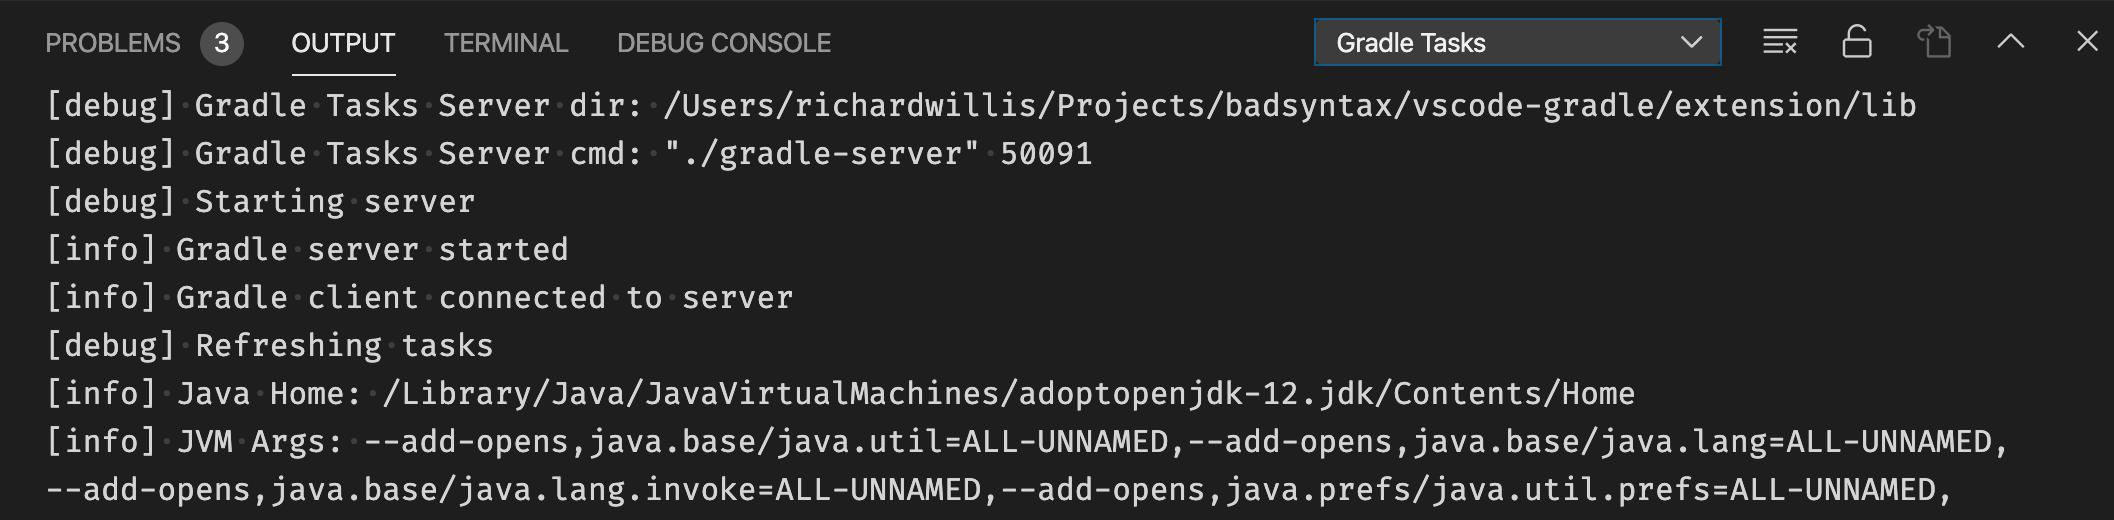 Gradle extension debug output